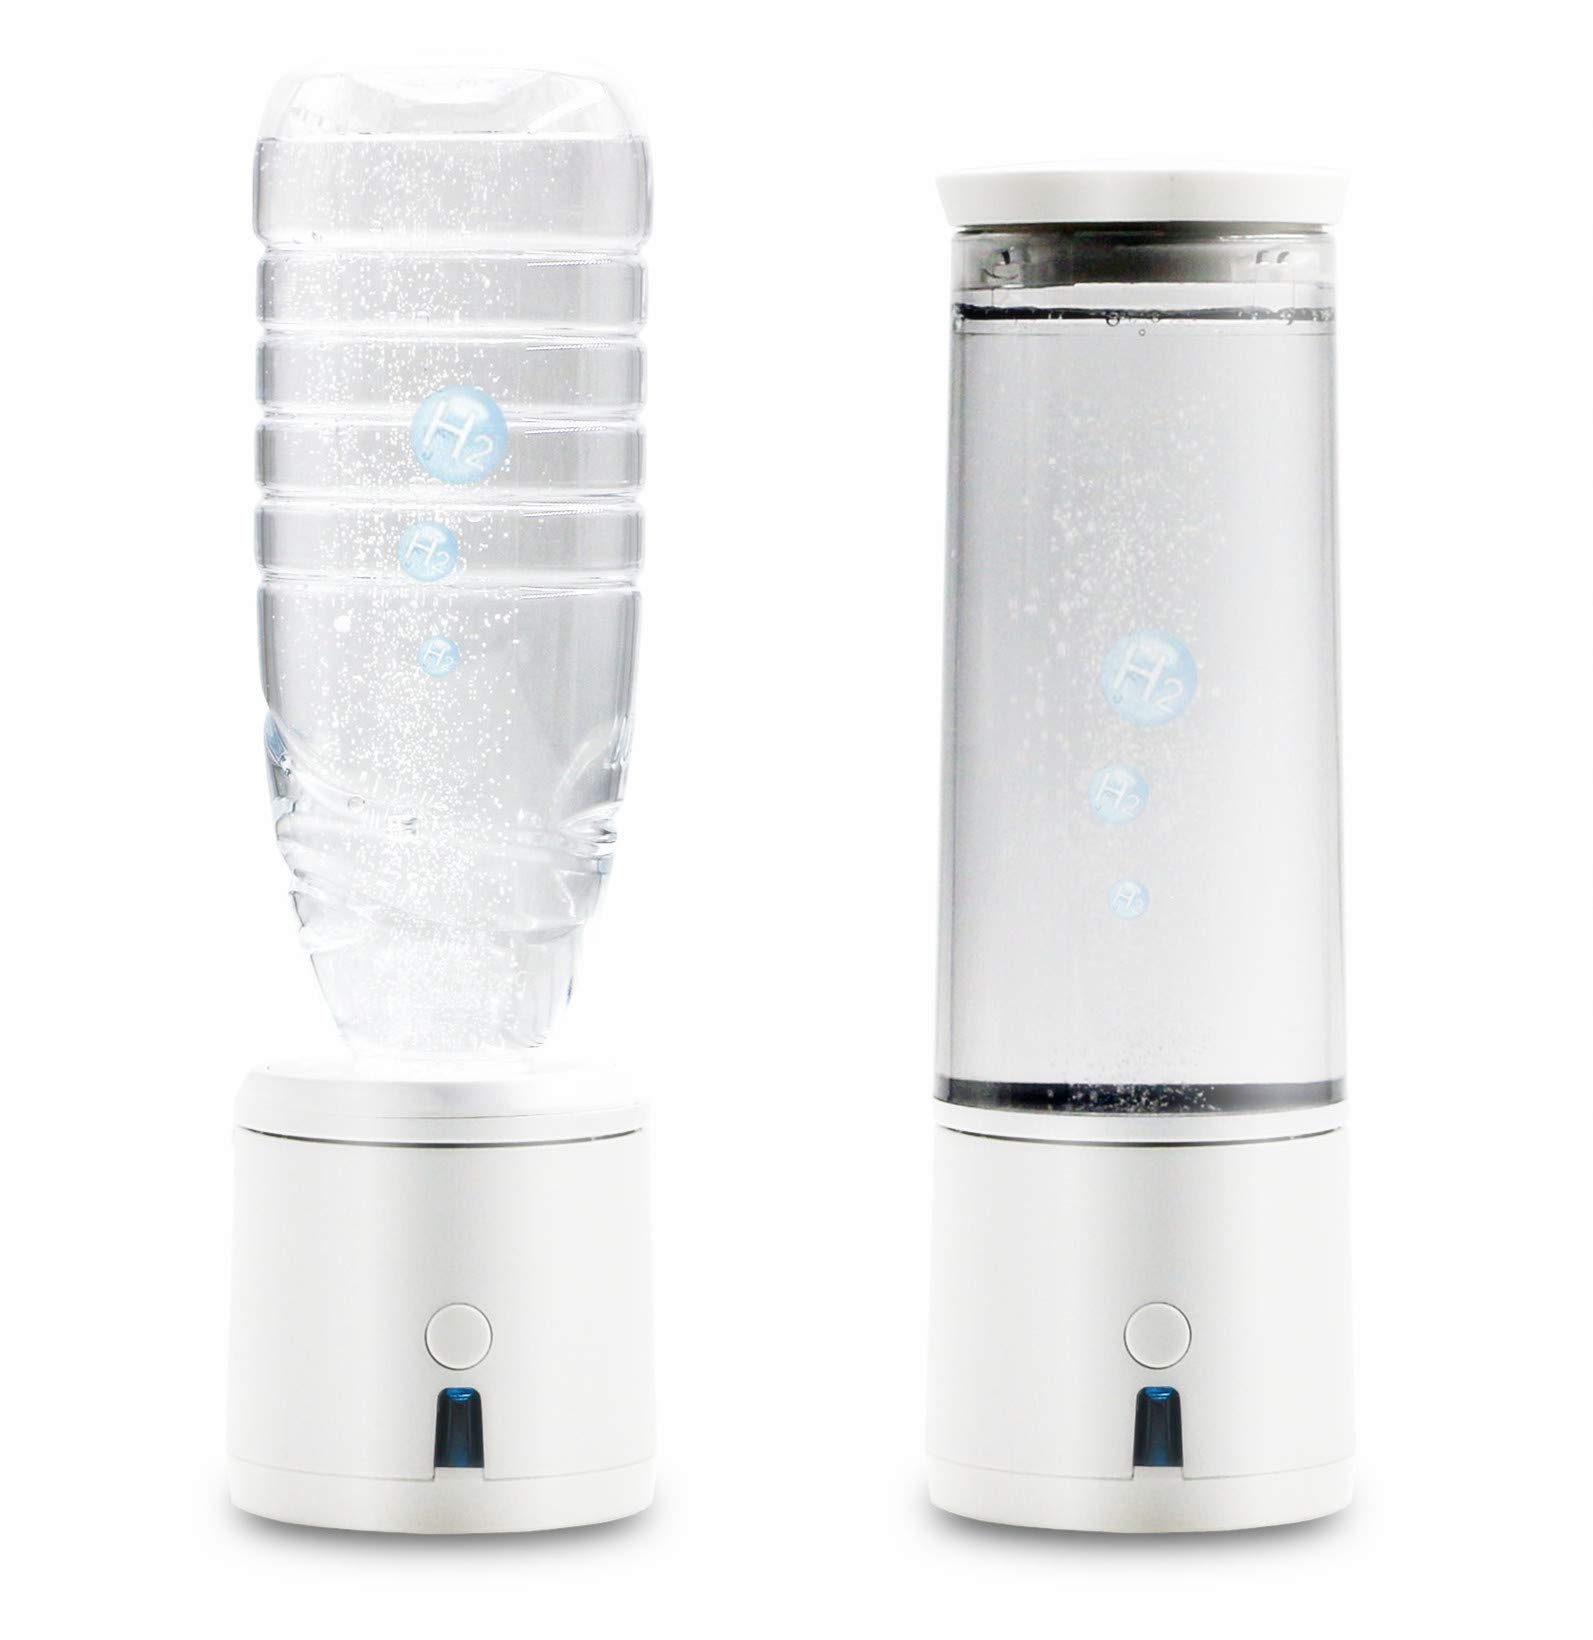 78f92857fc AlkaDrops Portable 5-mins SPE/PEM Membrane Hydrogen Water Bottle  Rechargable Ionized Water Generator Hydrogenated Water Bottle Removal O3  CL2,300ml